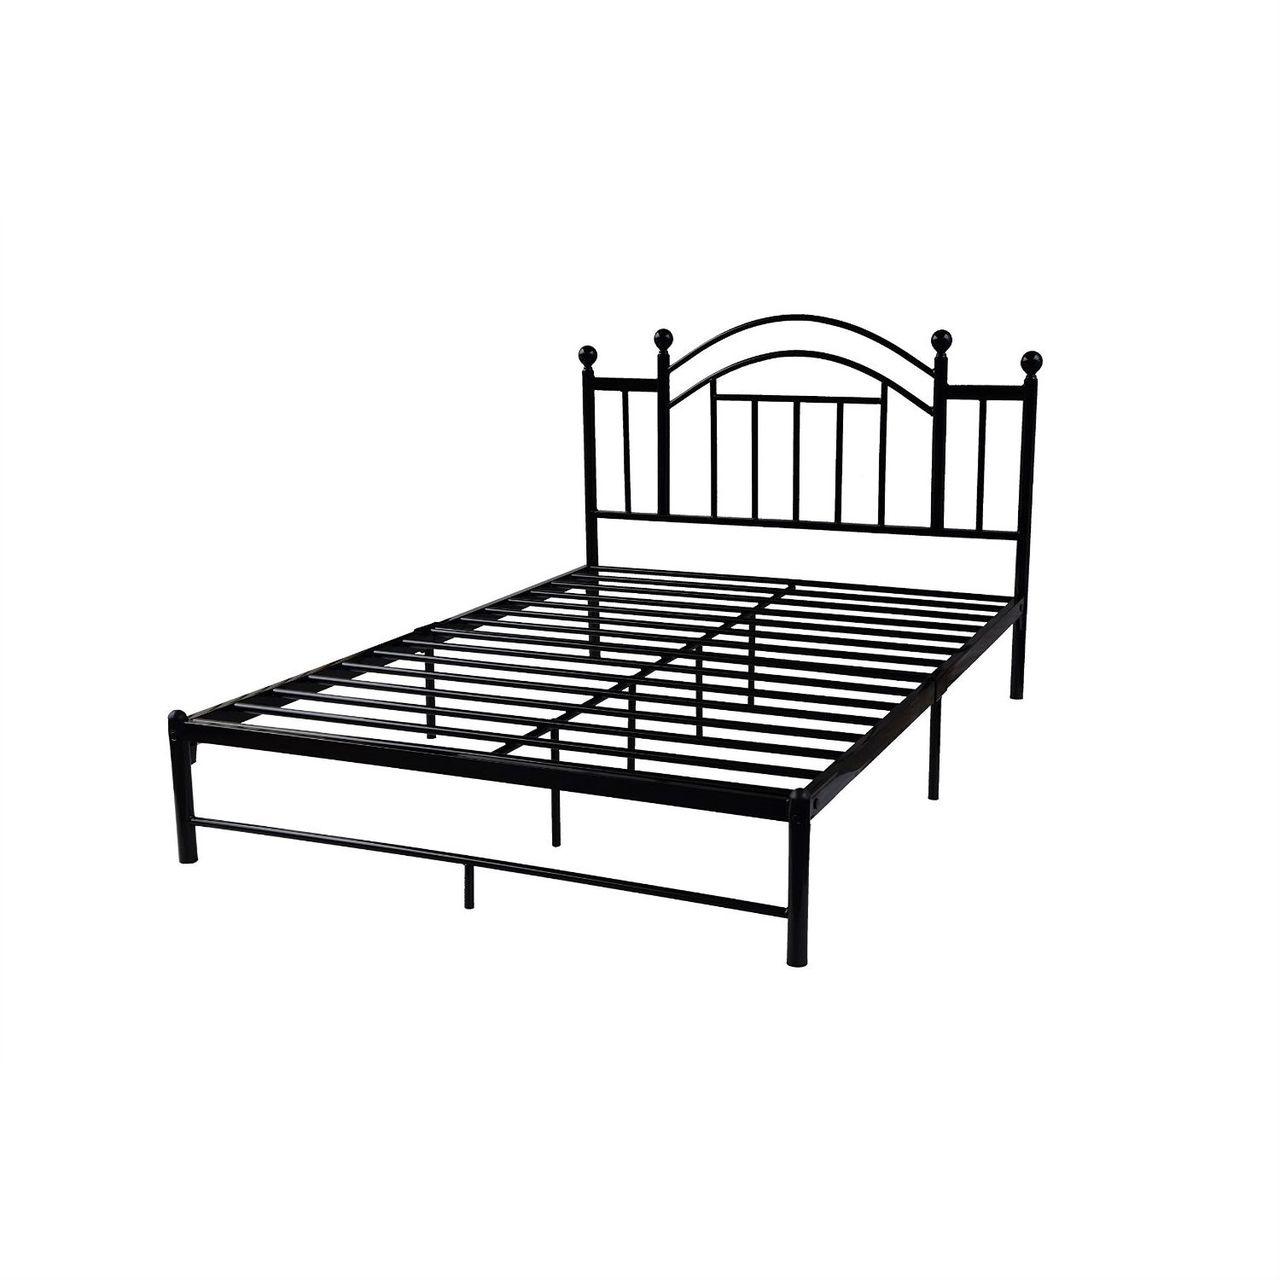 Full Black Metal Platform Bed Frame With Arched Headboard Metal